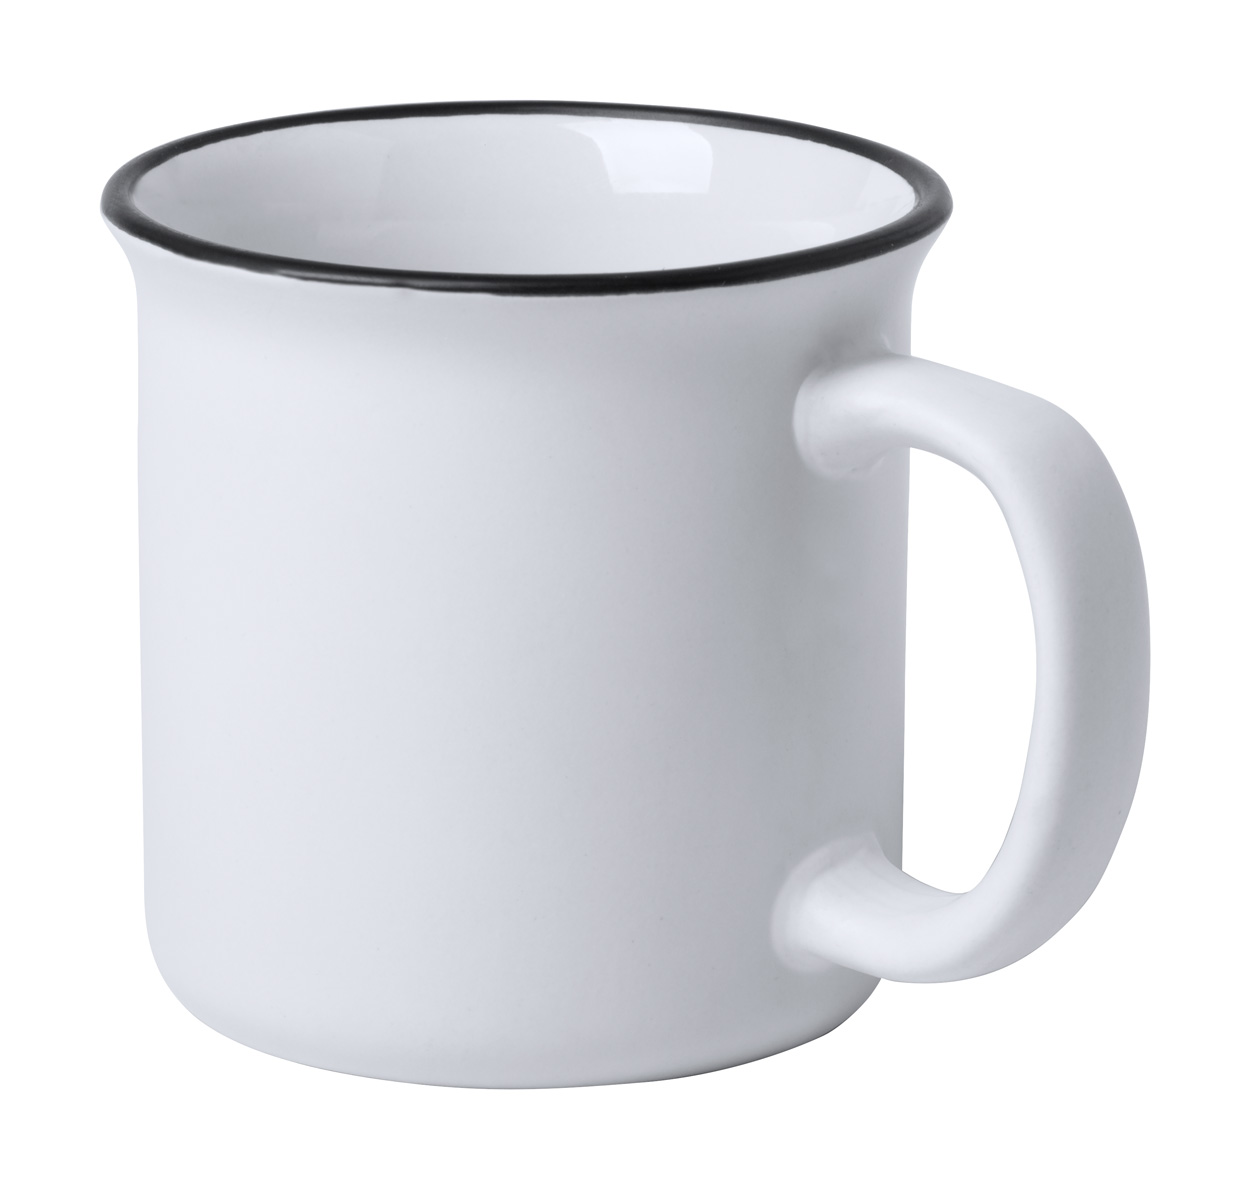 Bercom vintage mug